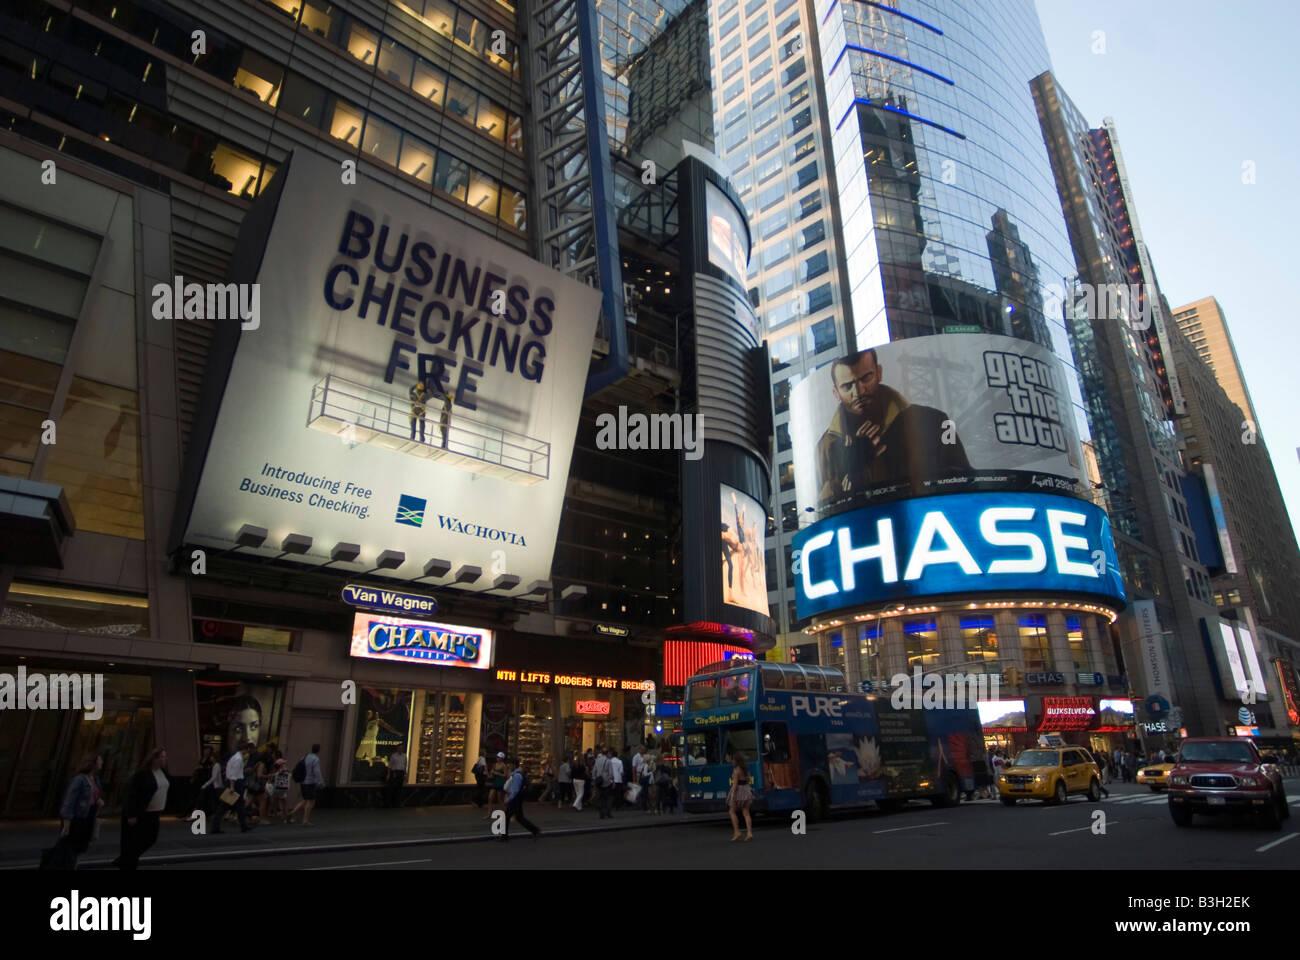 An advertisement for Wachovia Bank and JP Morgan Chase bank